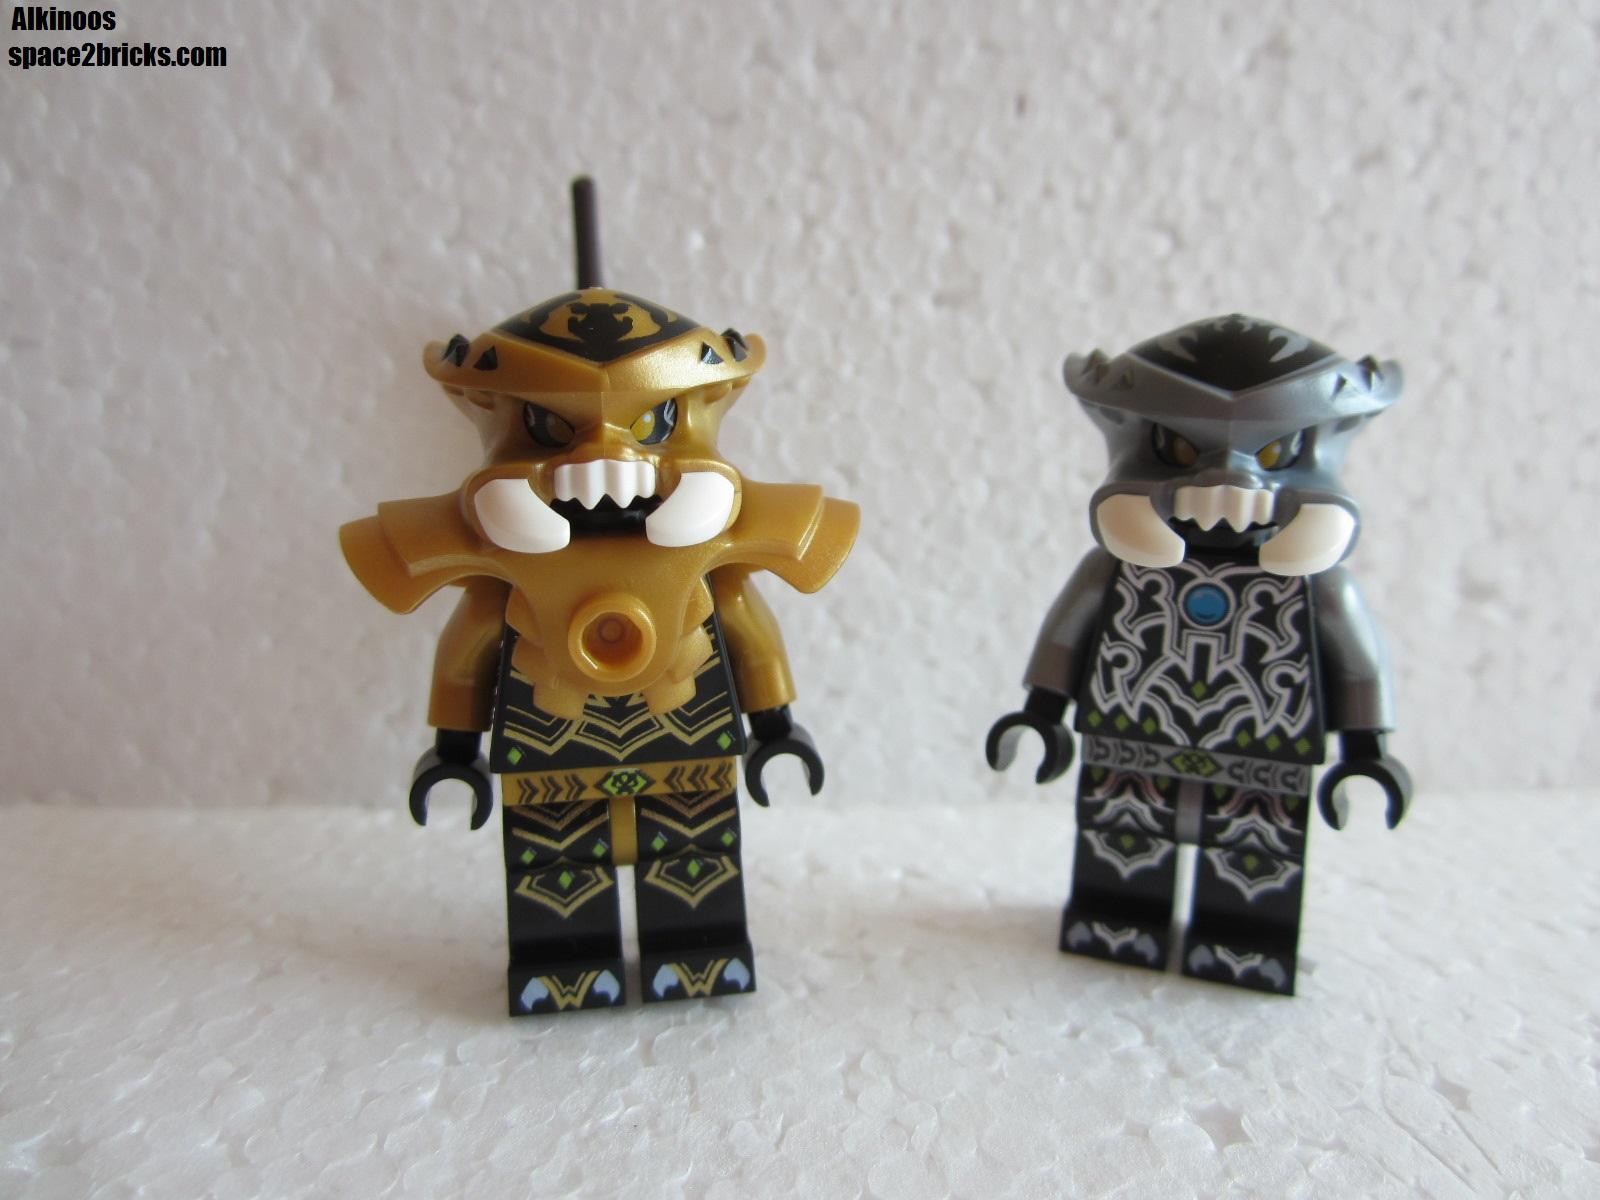 10 lego chima coloriage a imprimer haut coloriage hd - Dessin lego chima ...